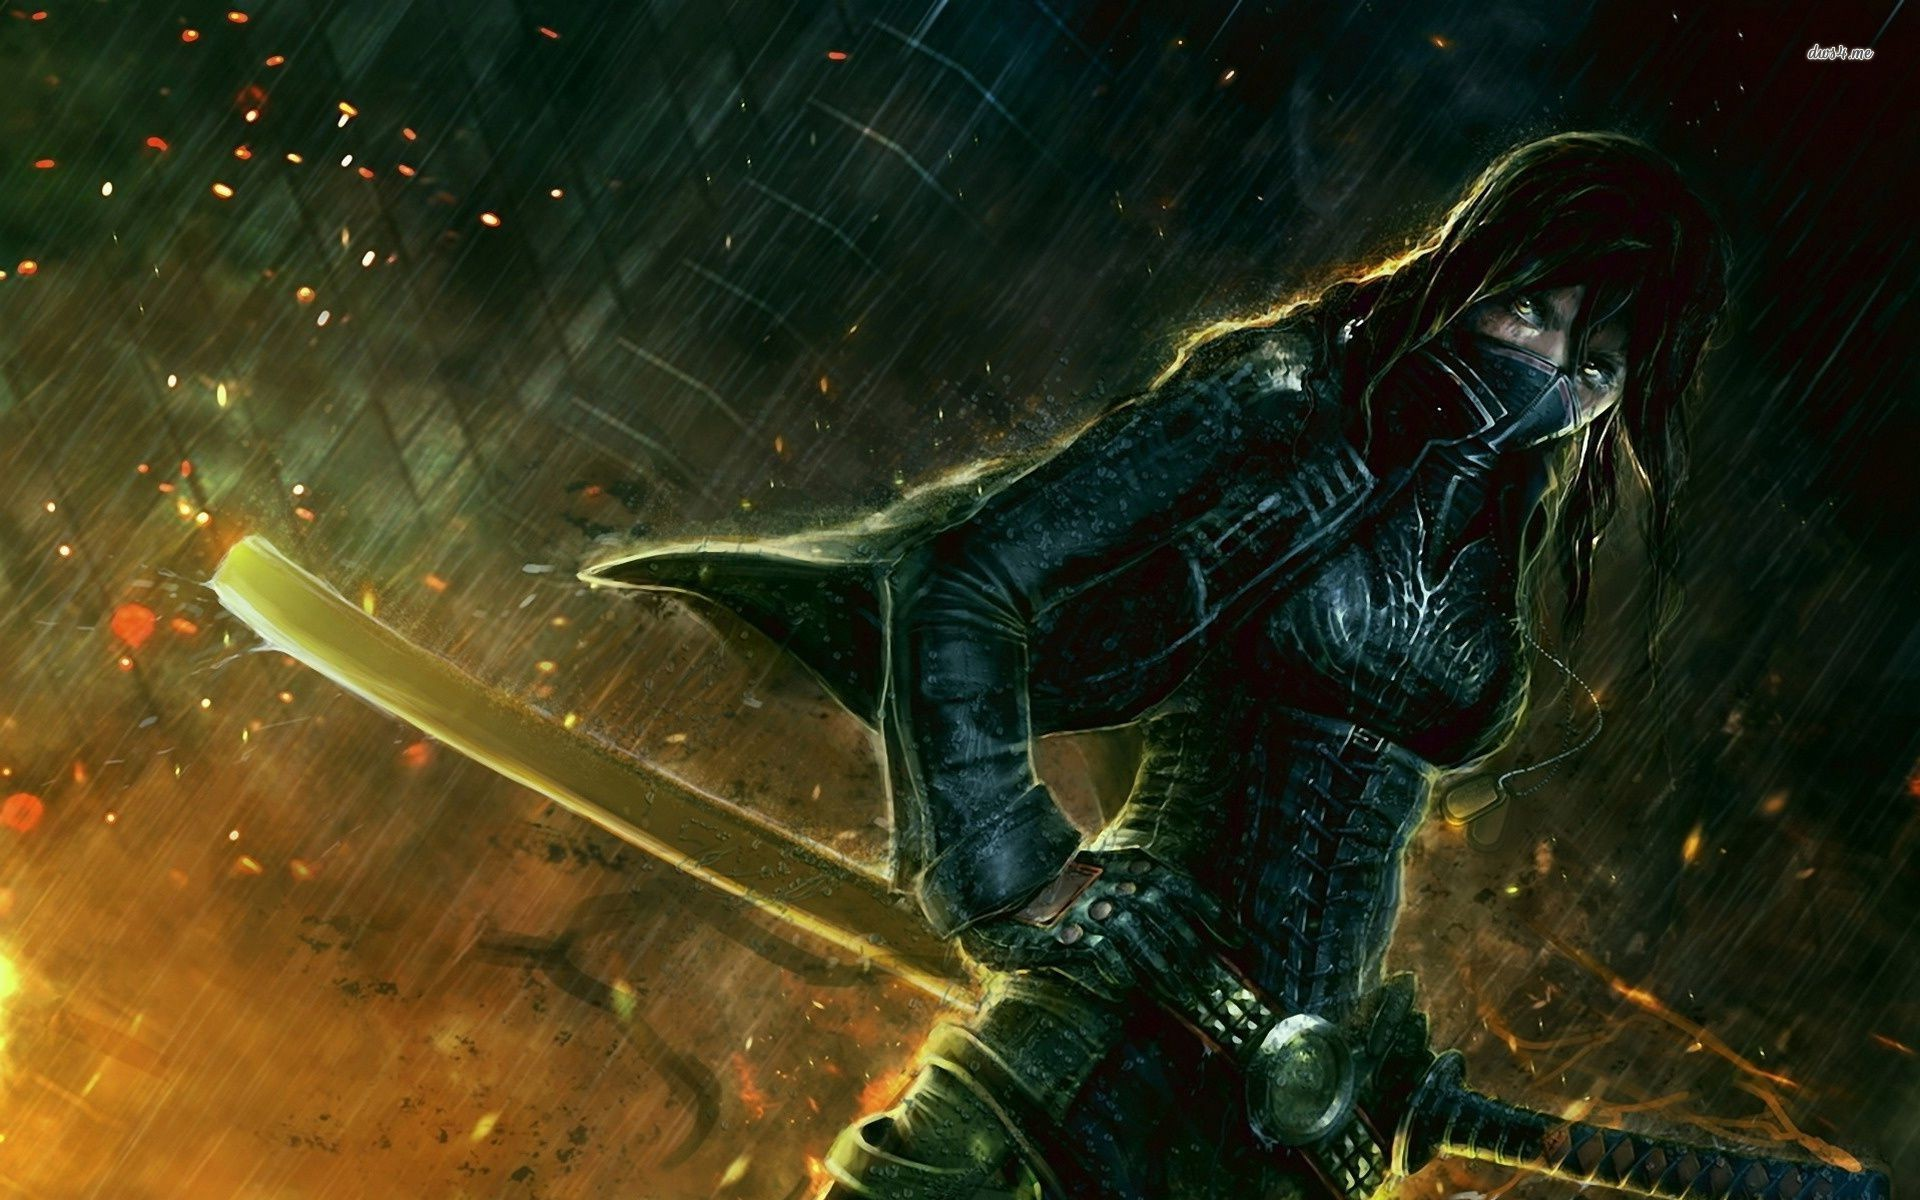 Res: 1920x1200, ... Samurai warrior girl in the rain wallpaper  ...